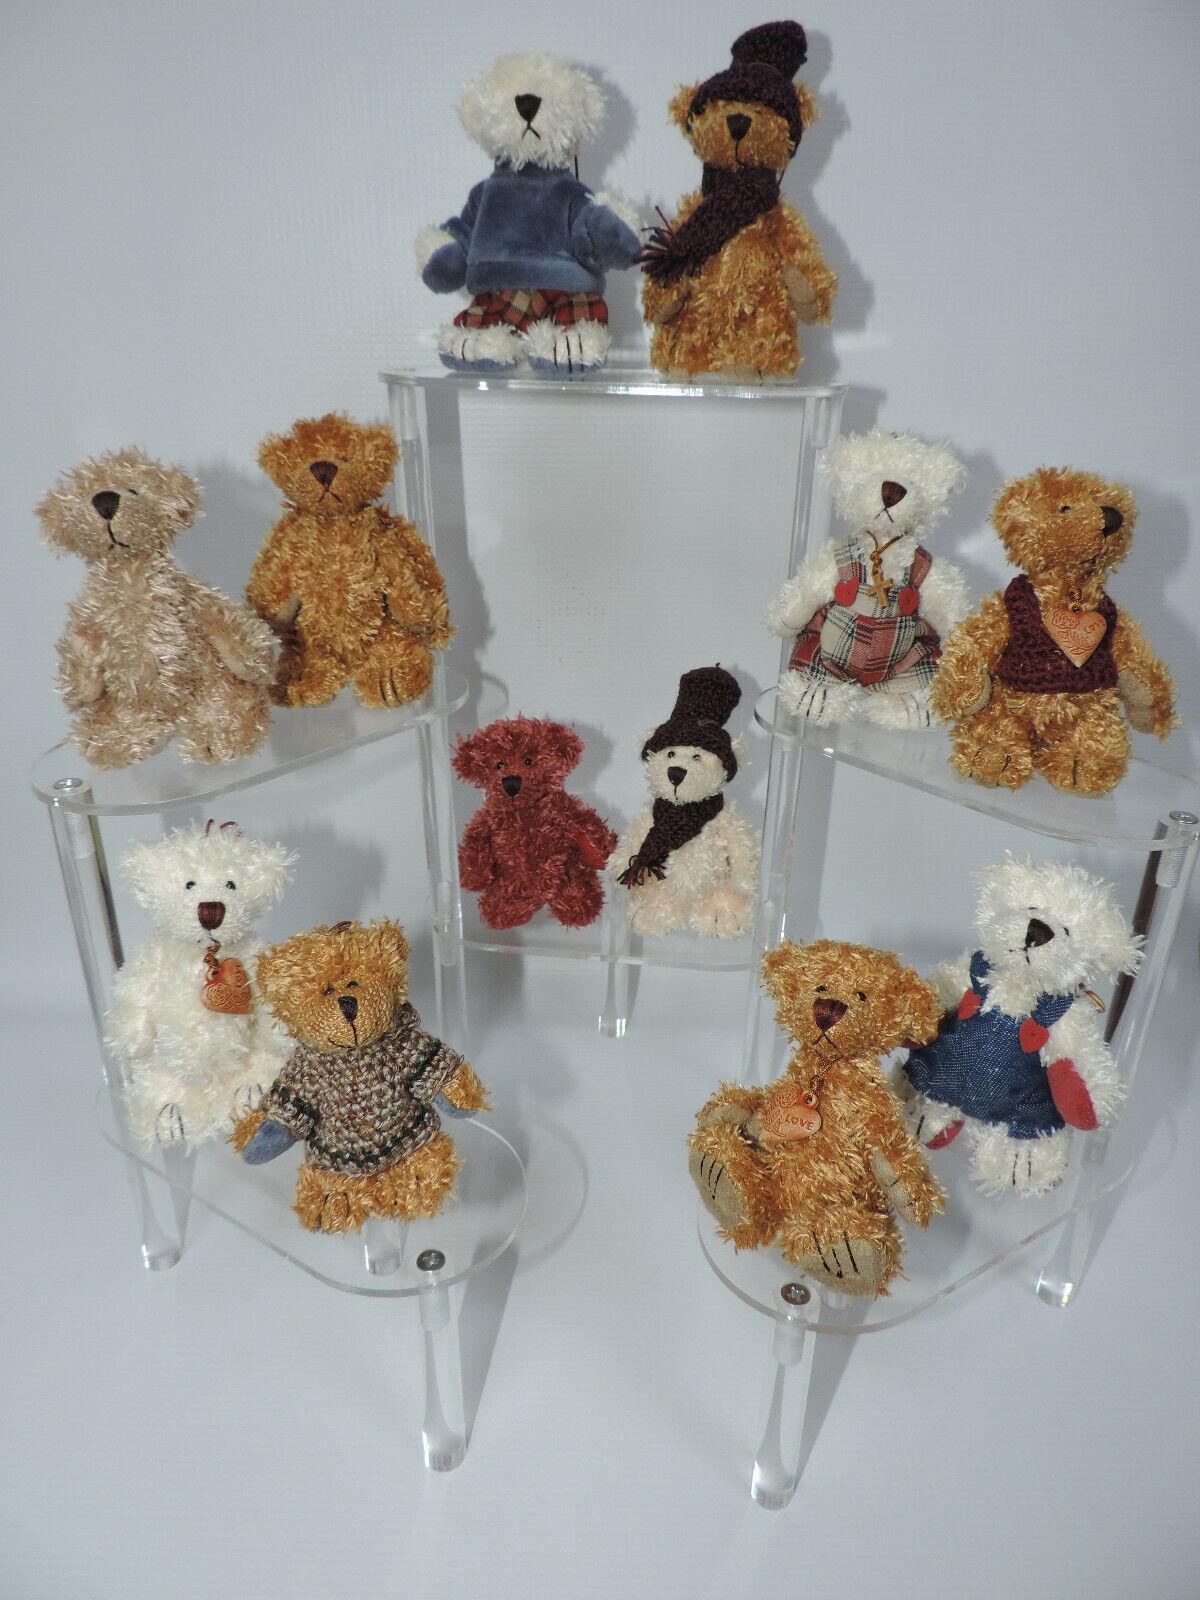 Купить Miniature Teddy Bear Ornaments - 12 pc. Assorted Set